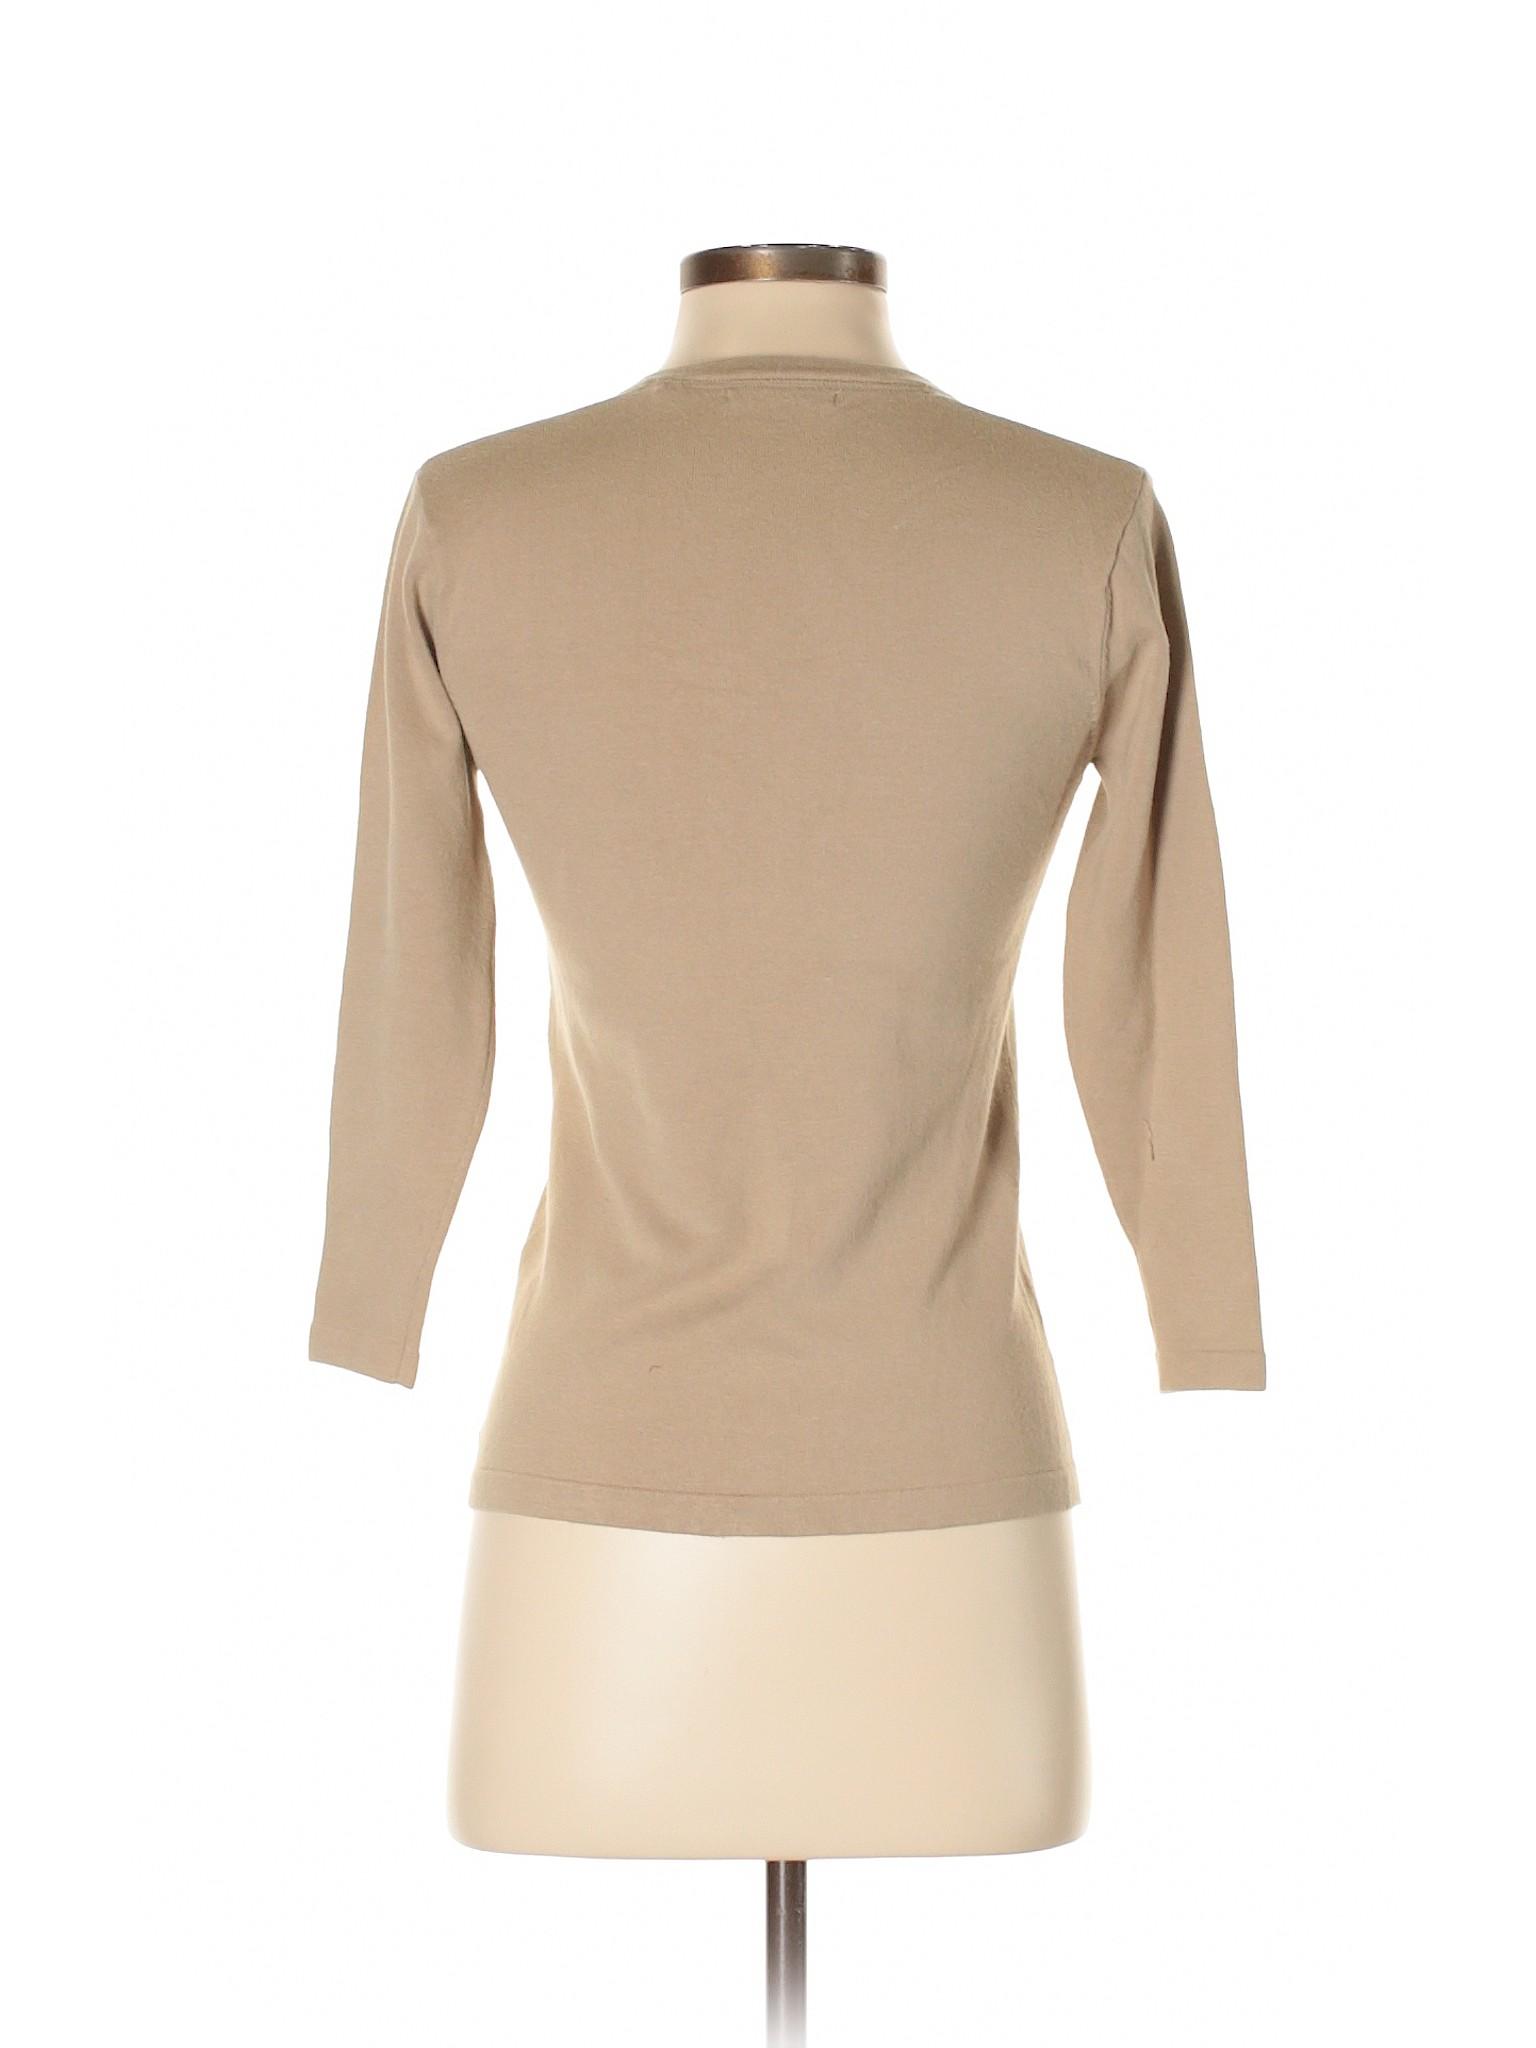 America 525 Sweater Boutique 525 Pullover Boutique CtvFvnq